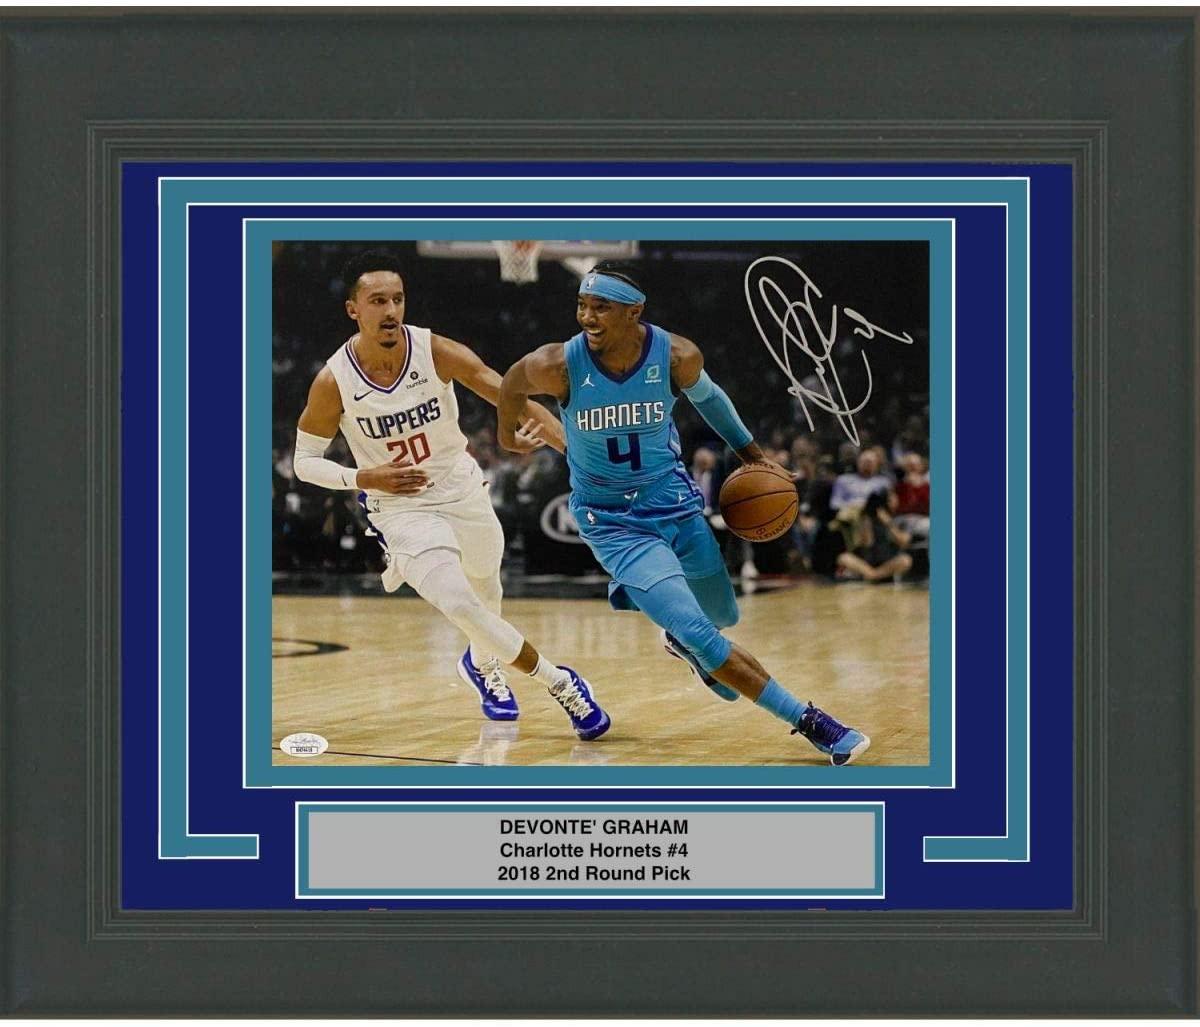 Framed Autographed/Signed Devonte' Graham Charlotte Hornets 11x14 Basketball Photo JSA COA